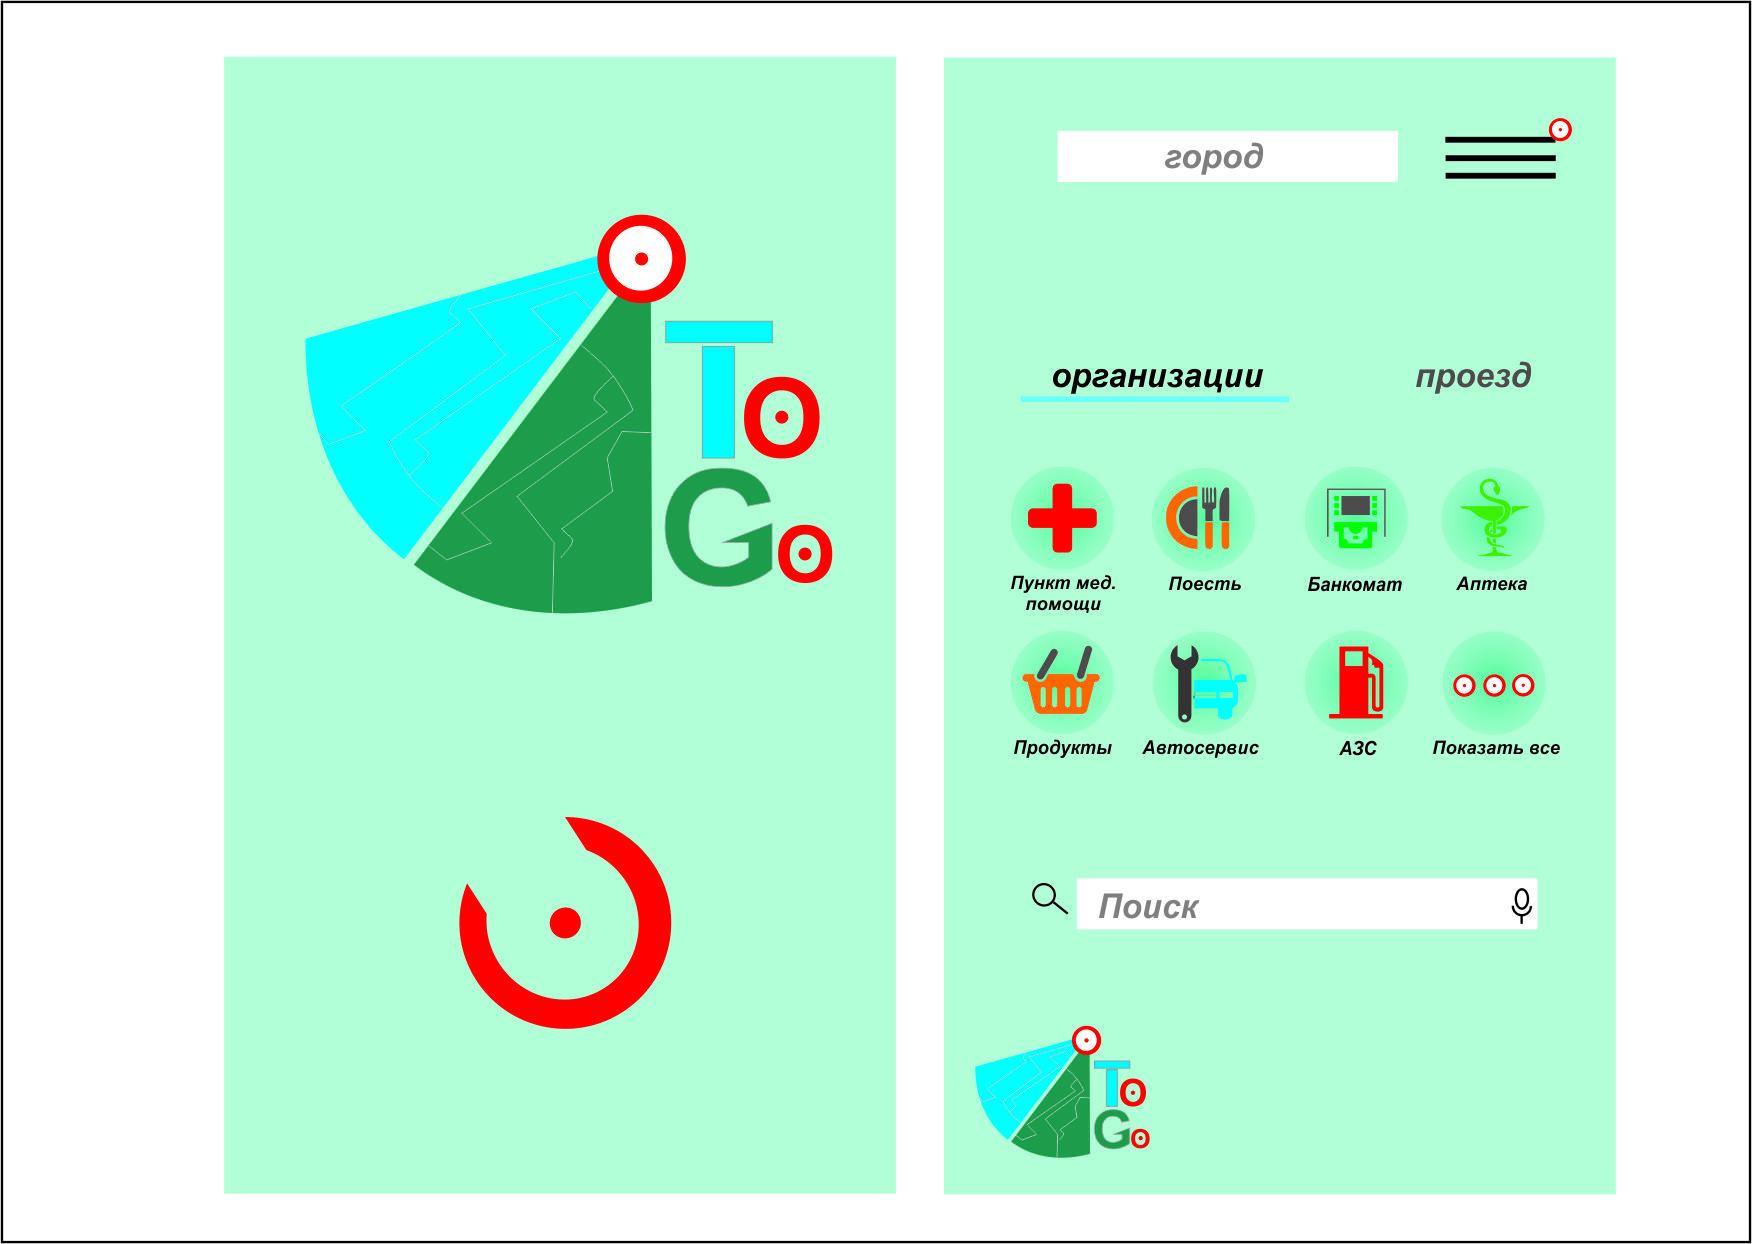 Разработать логотип и экран загрузки приложения фото f_0345a8bbee54fc69.jpg